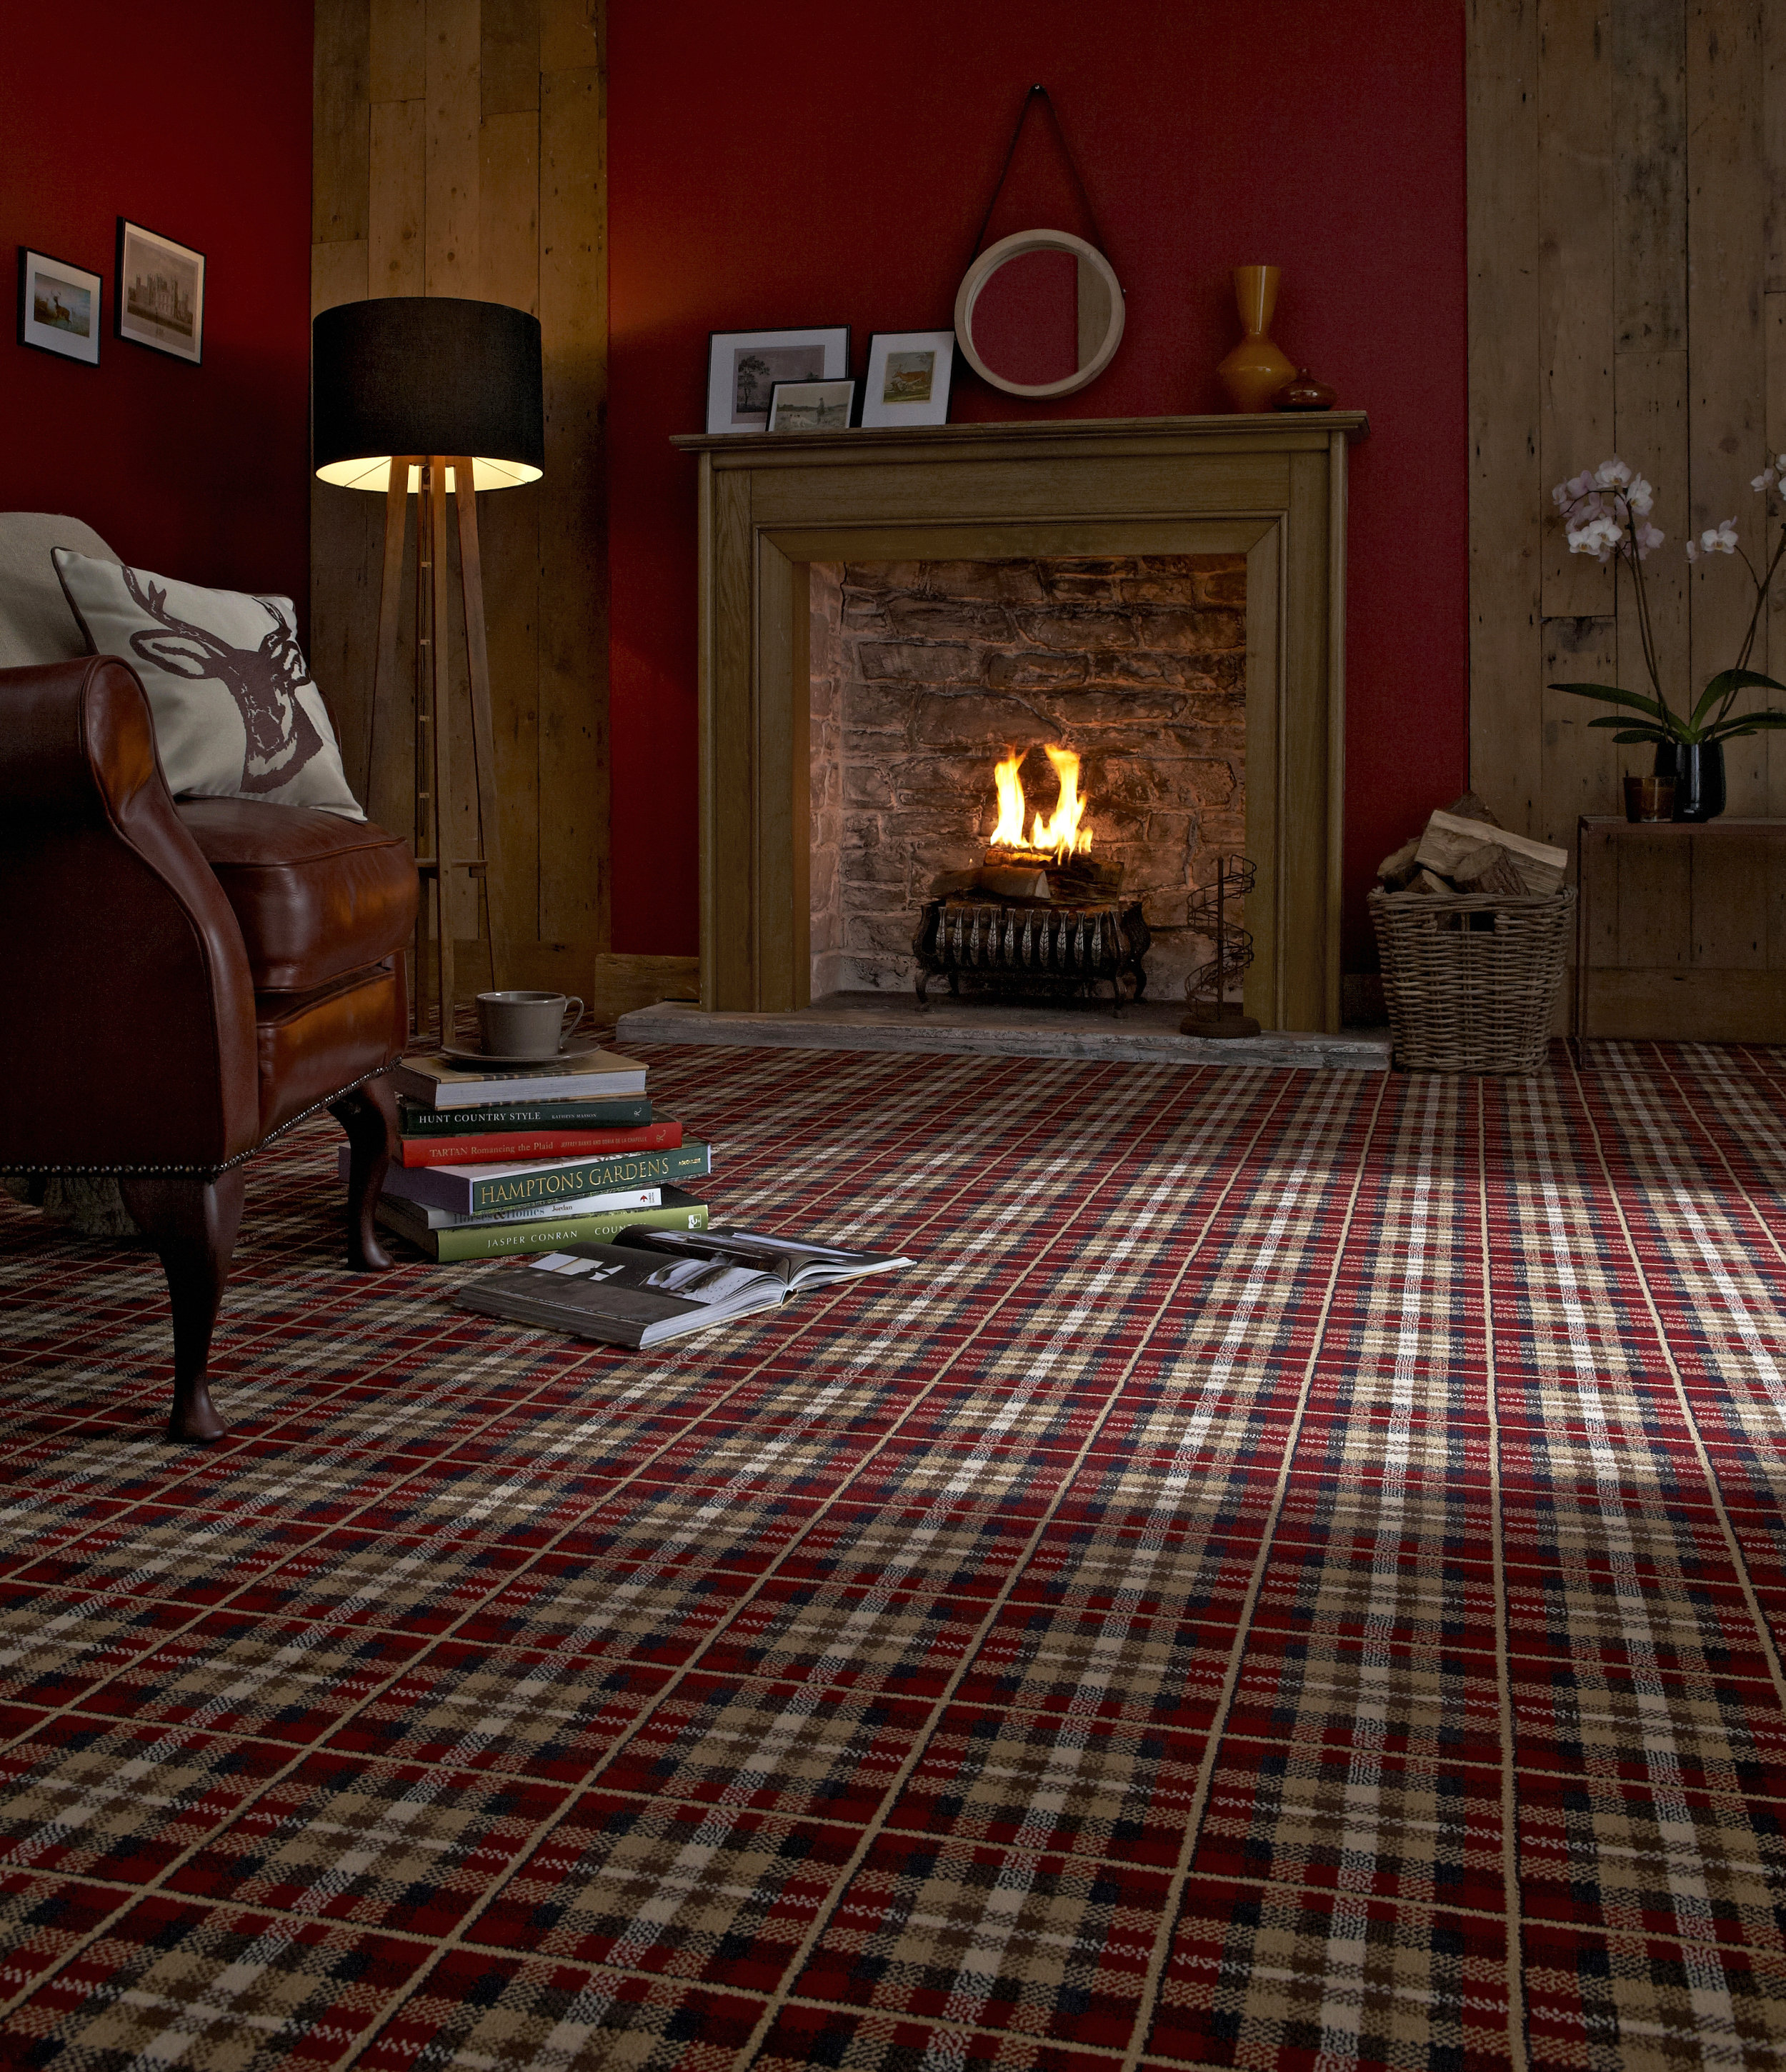 The bold Tartan design from Lifestyle floors